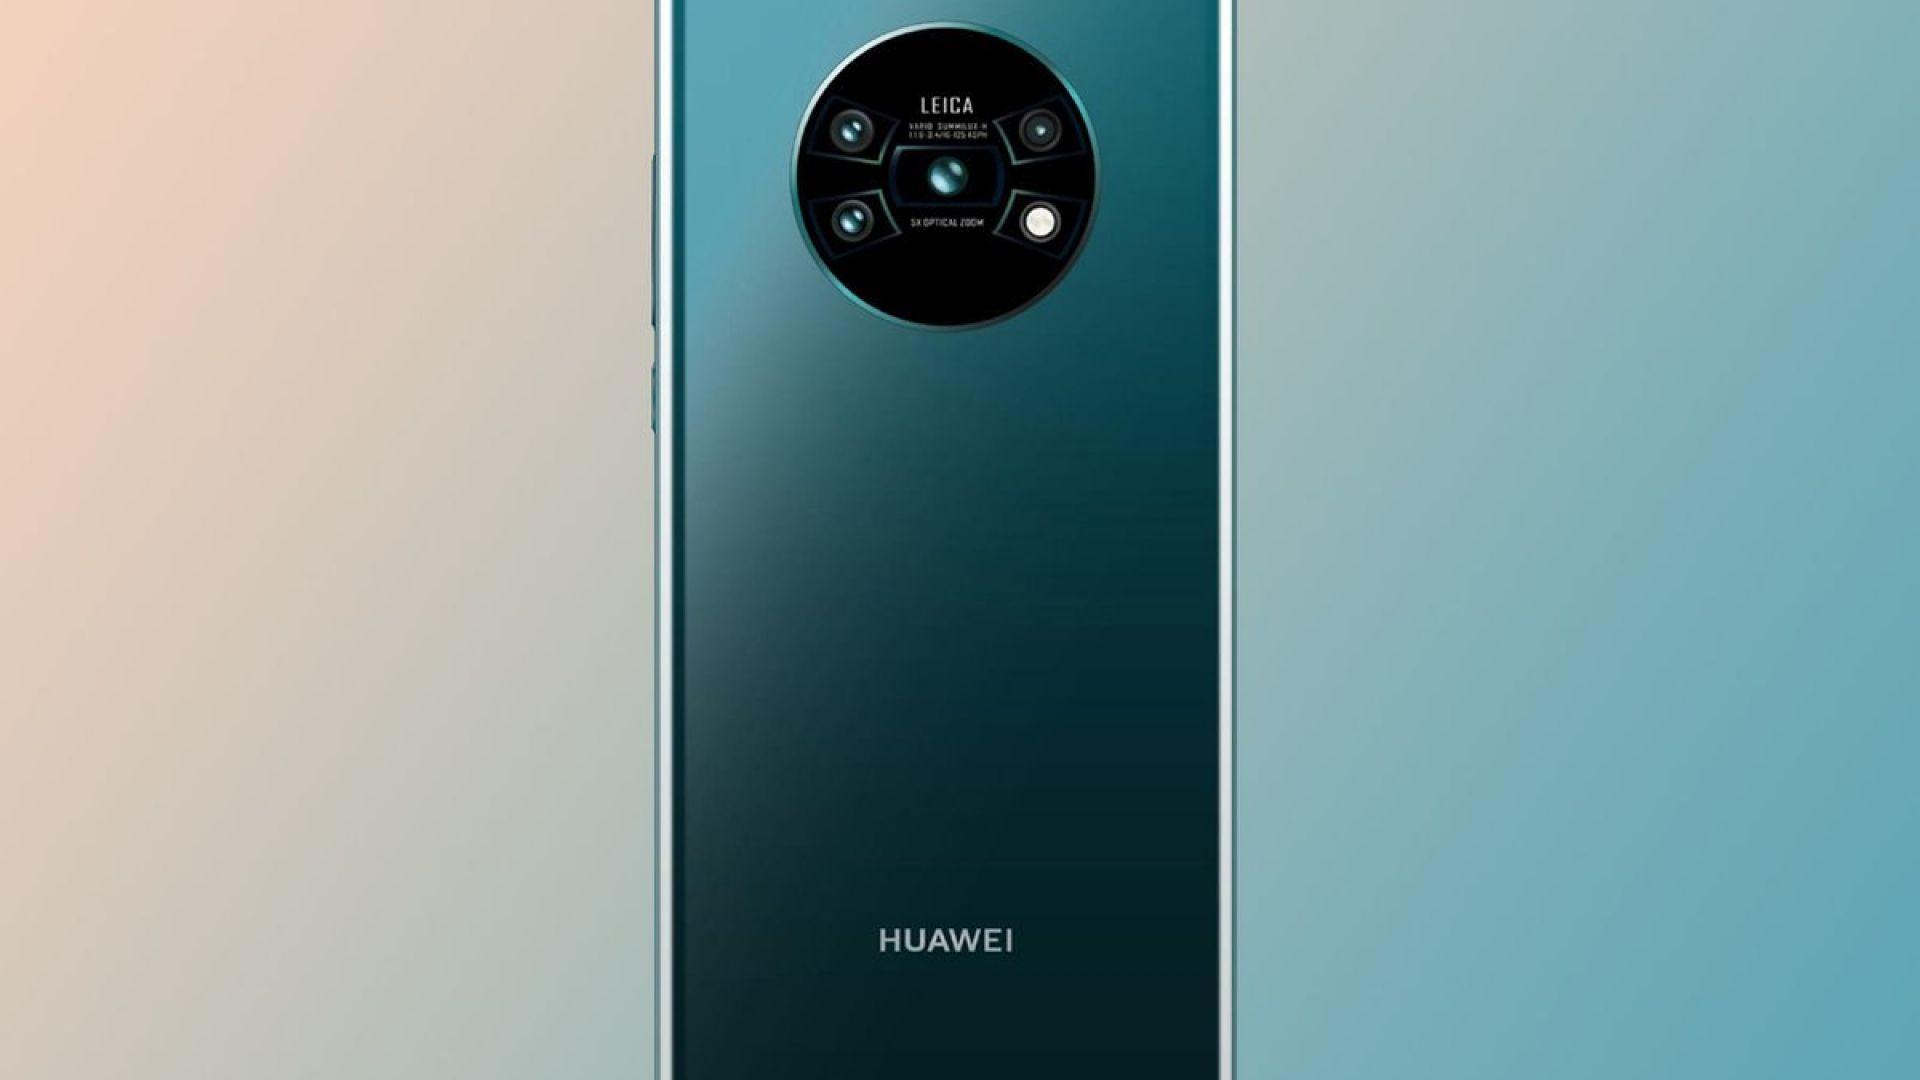 Представиха новия Хуаей с 5G в Кувейт